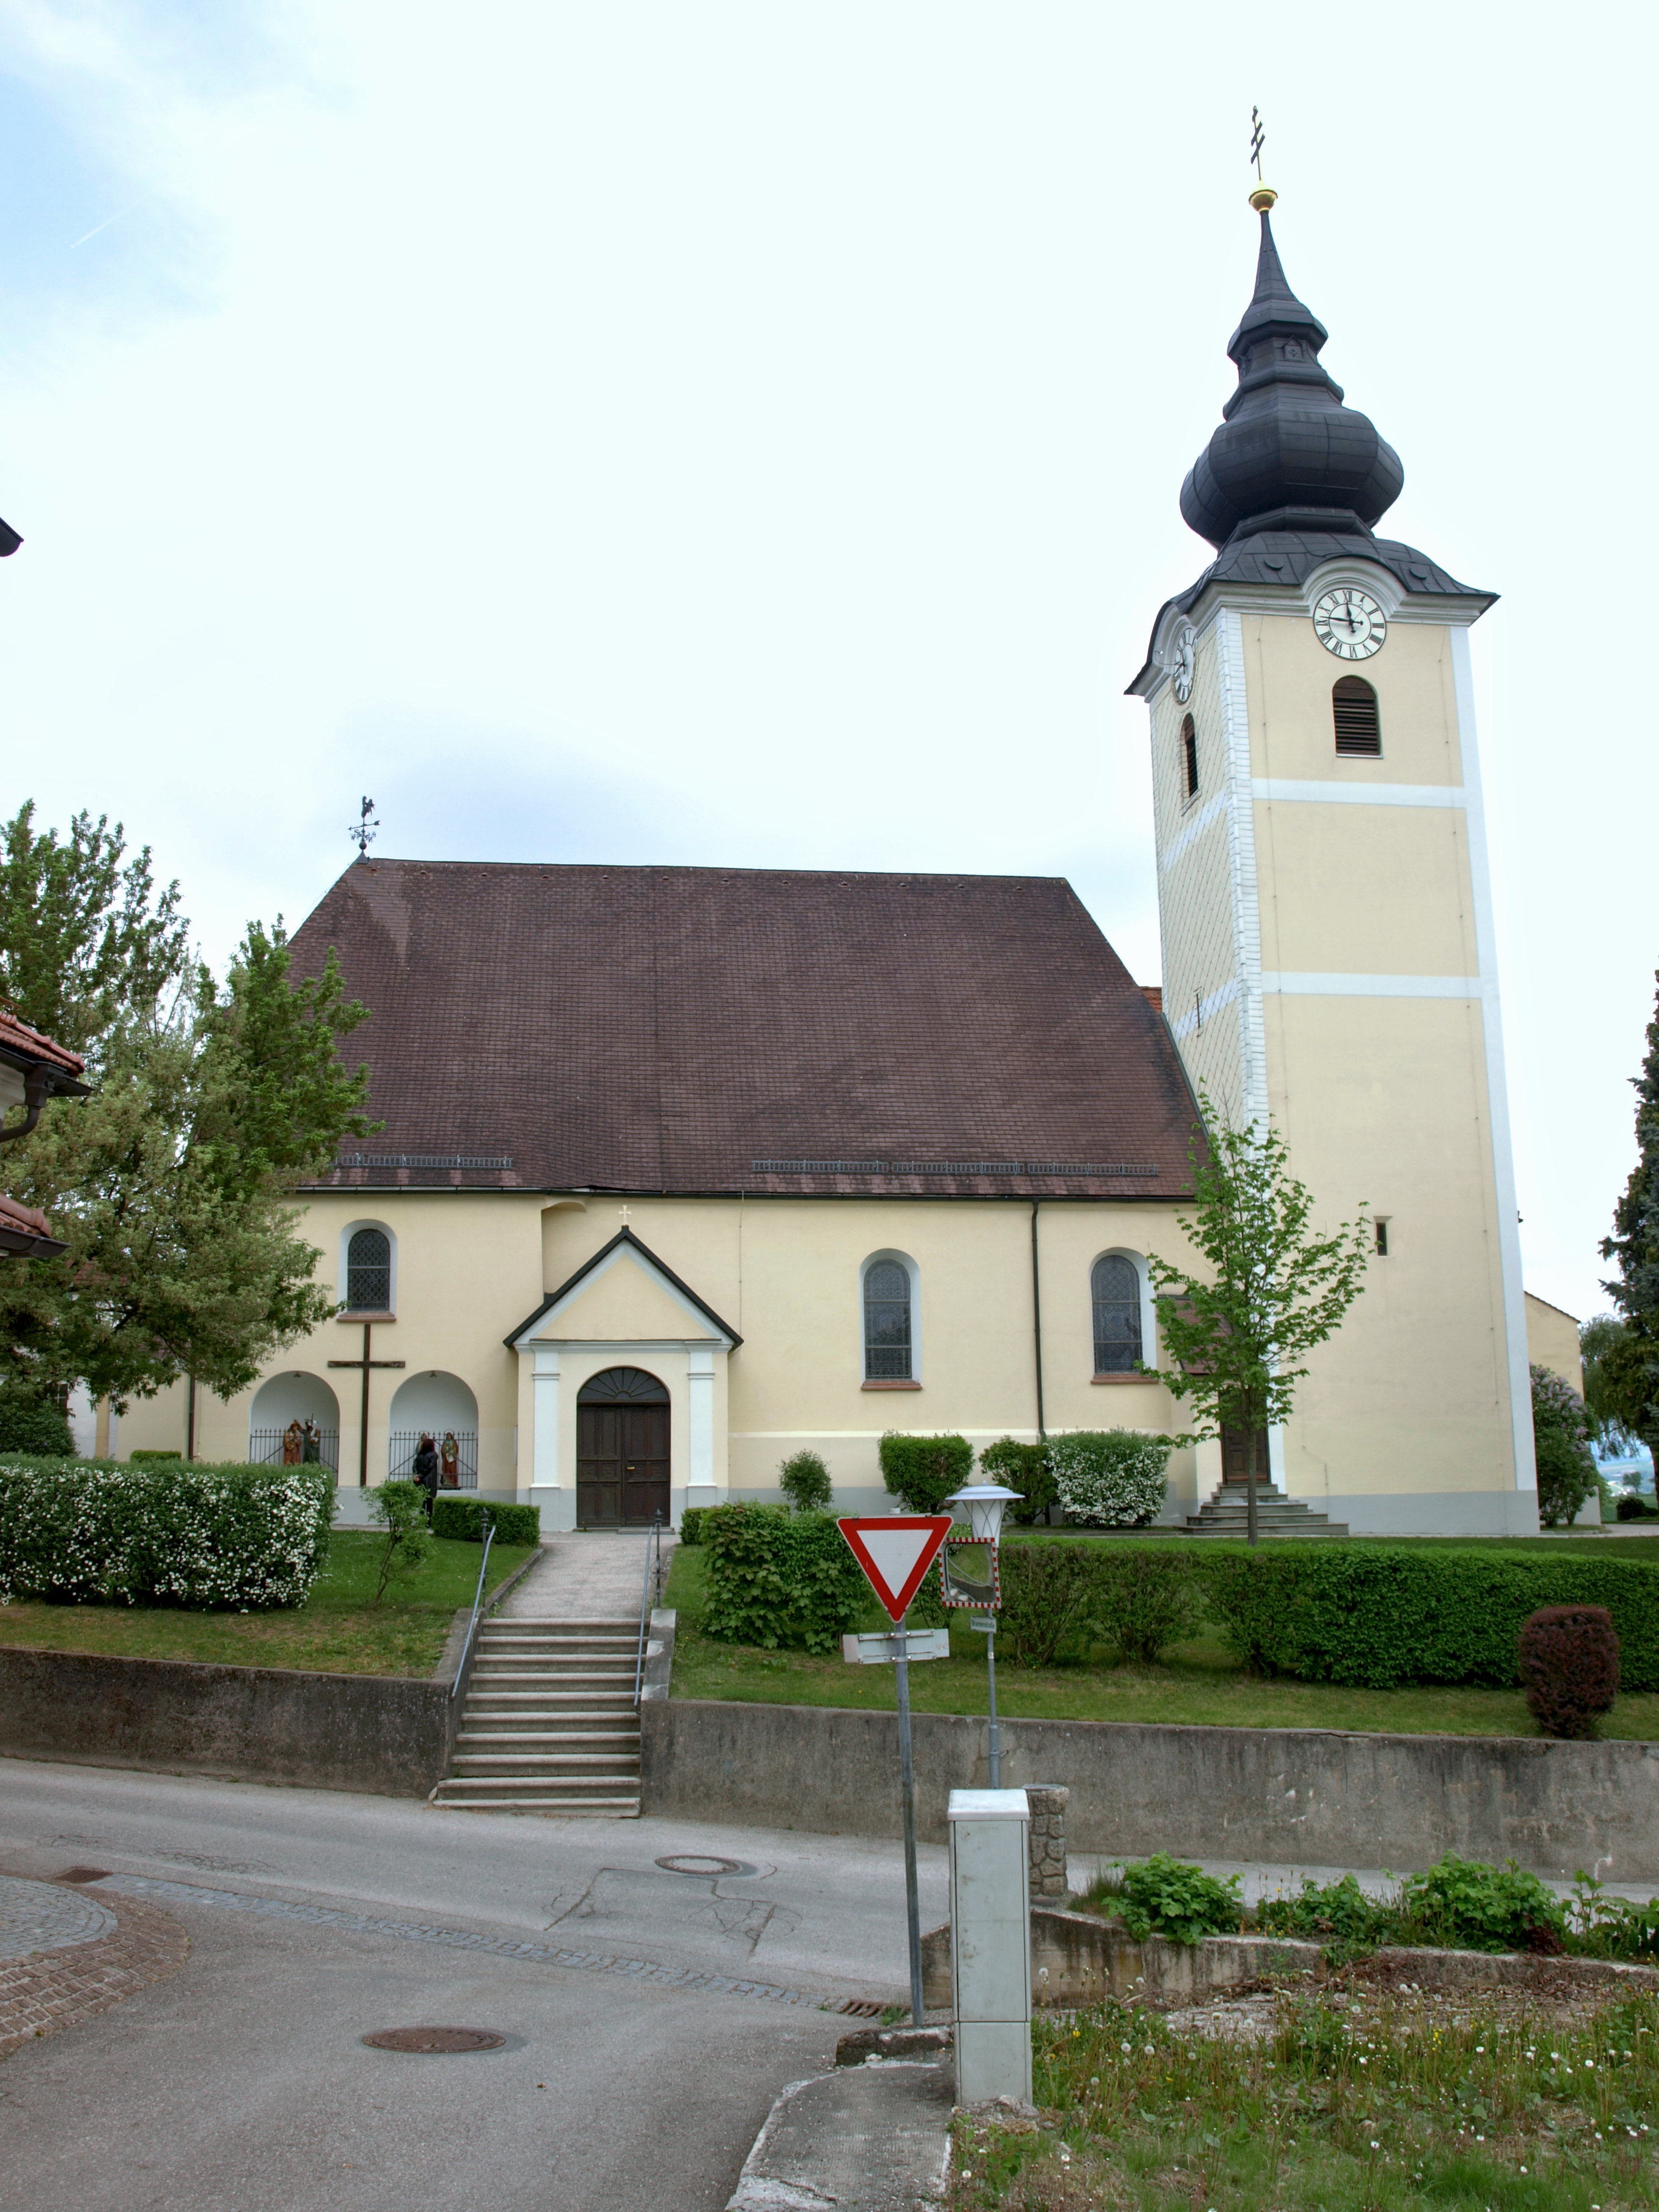 2012.05.03_-_Euratsfeld_-_Pfarrkirche_hl._Johannes_-_10.jpg